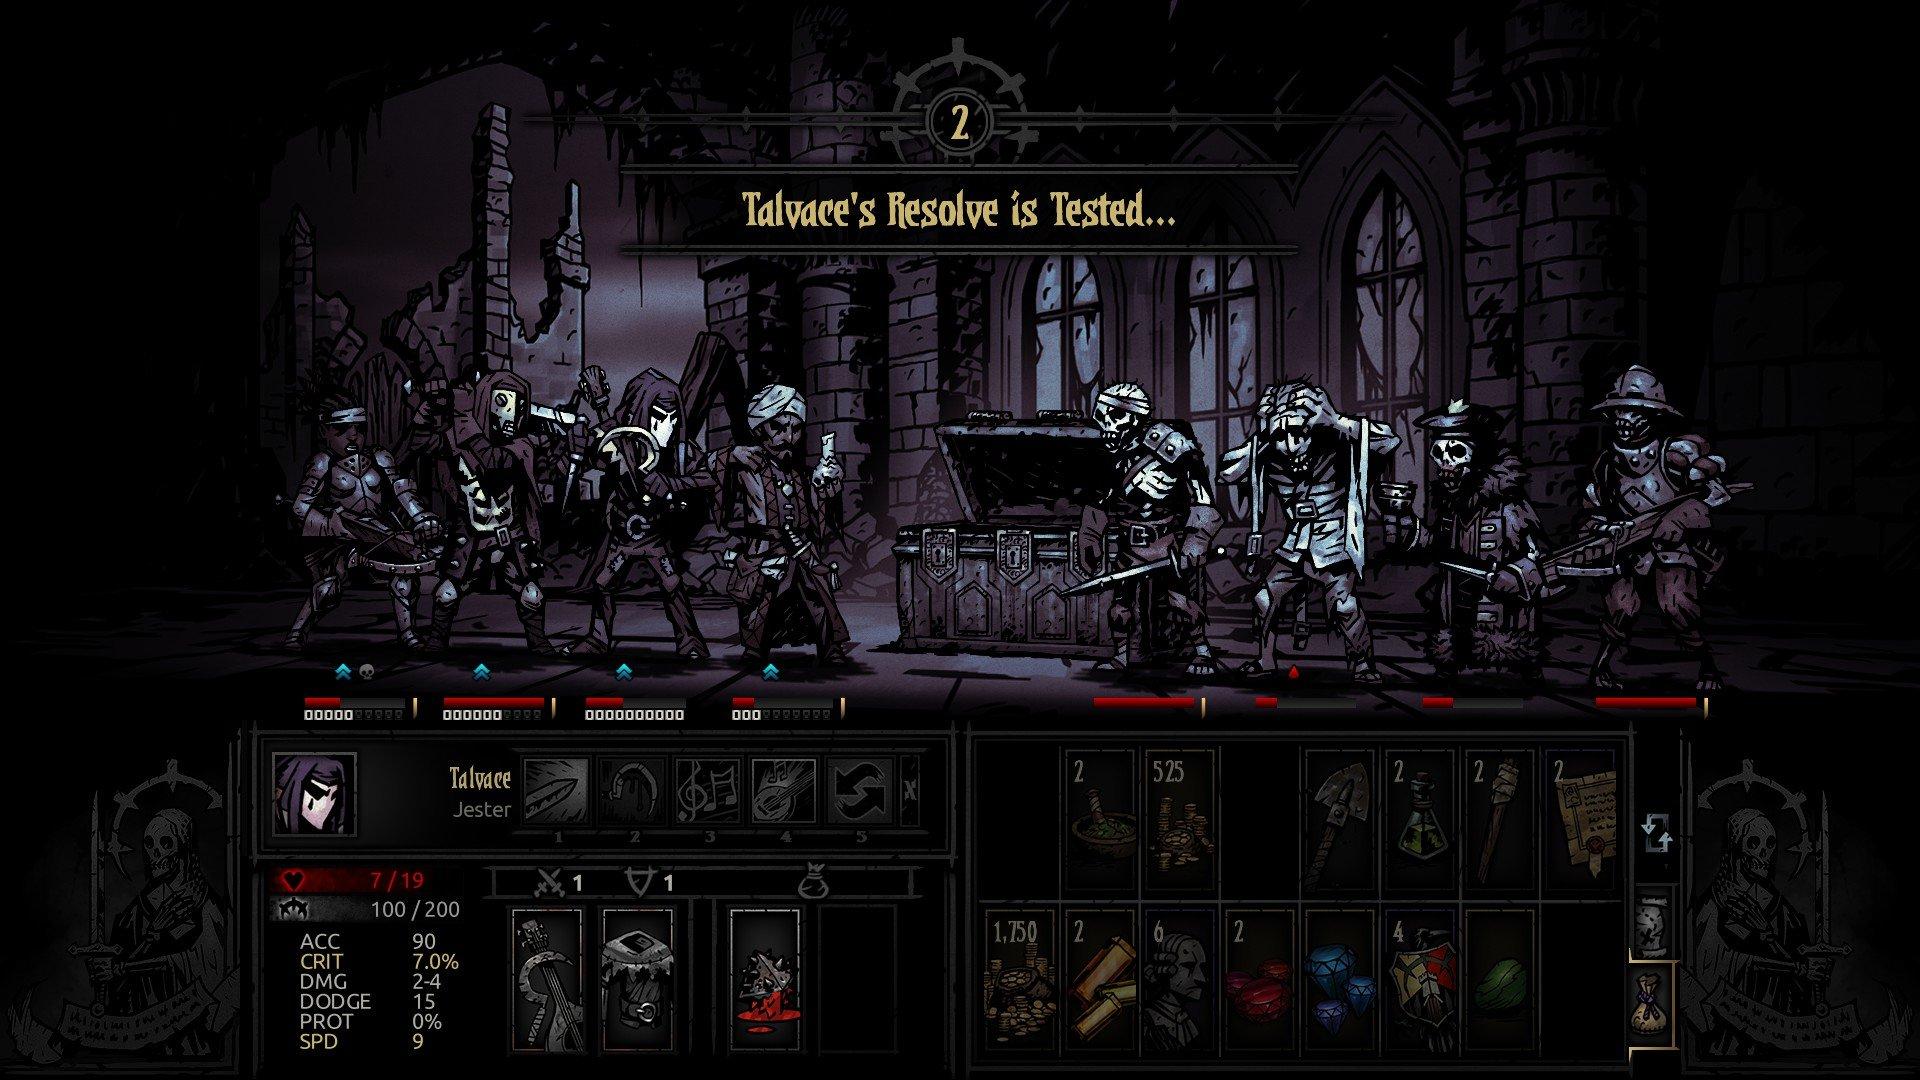 Darkest Dungeon: Lovecraftian PTSD simulator will cause your